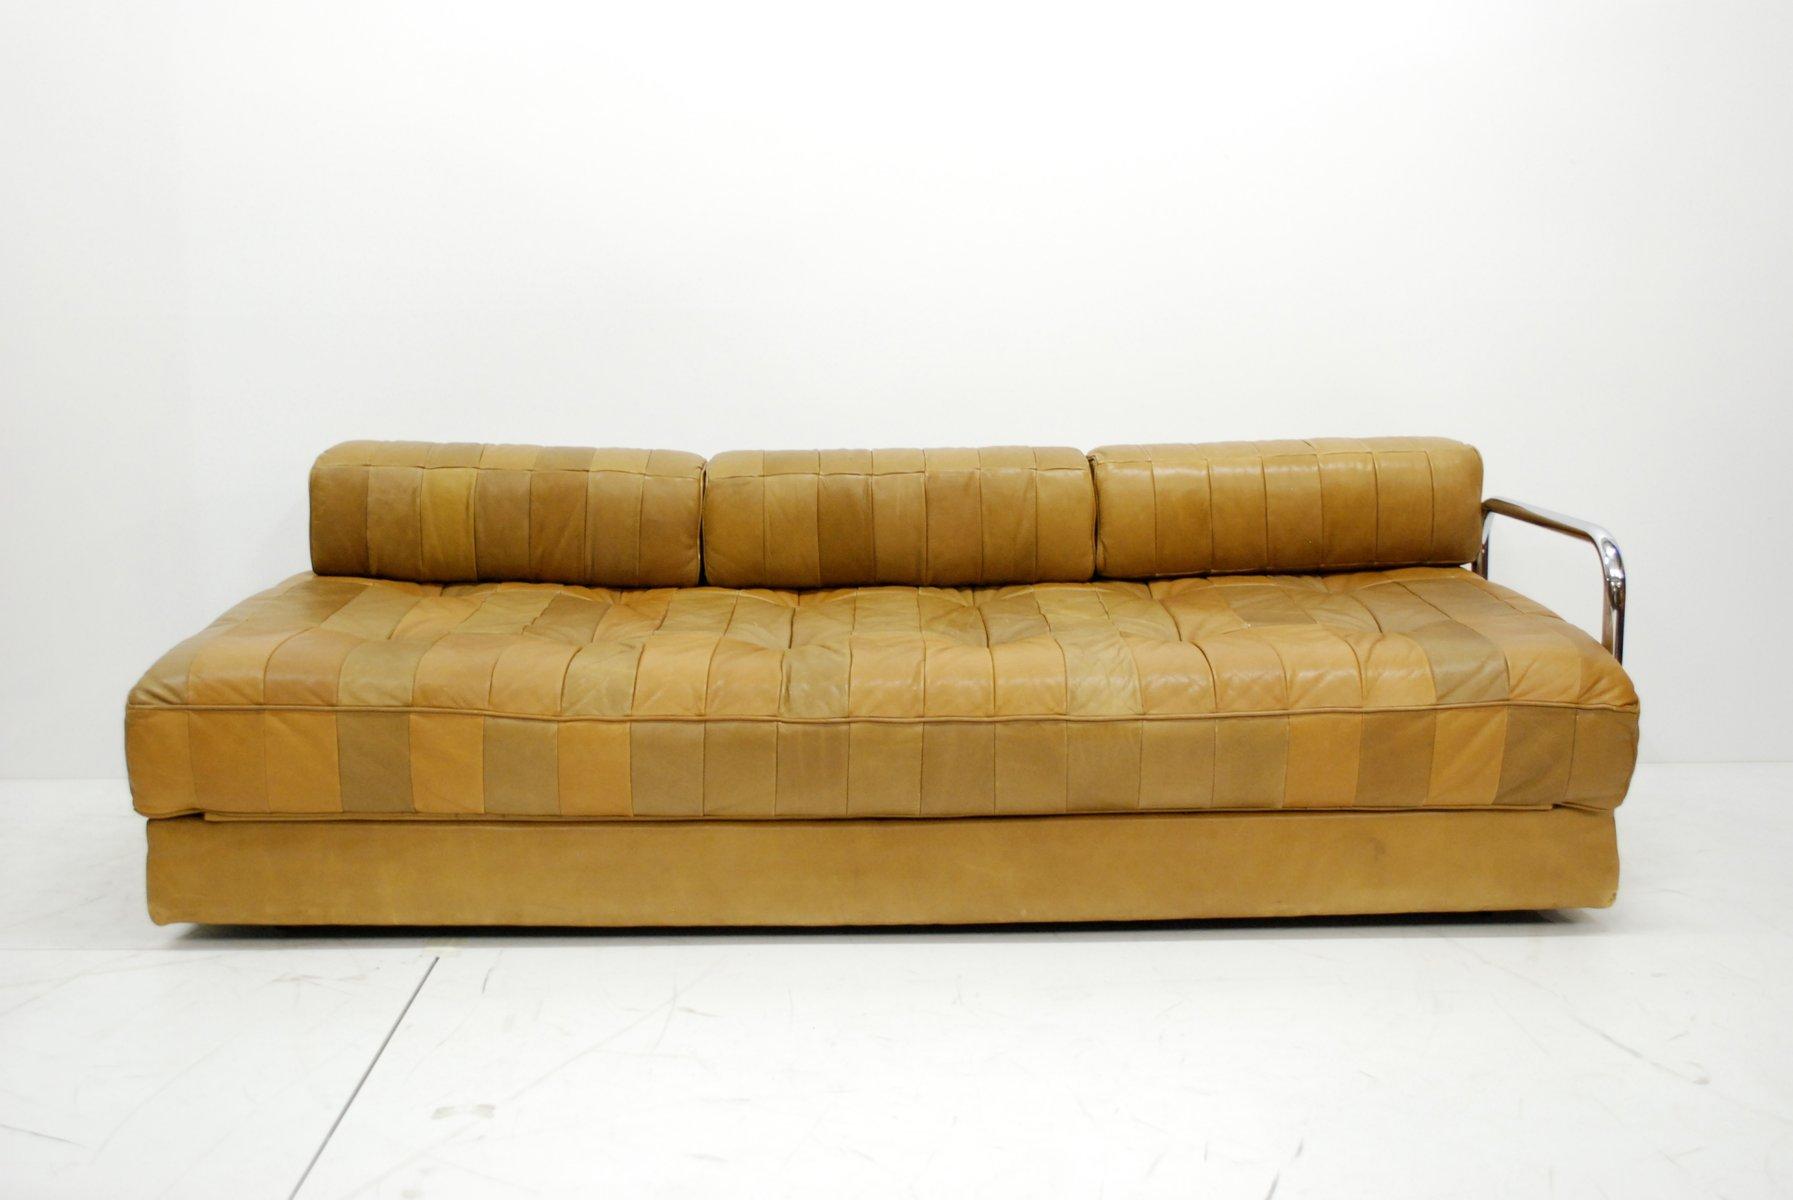 vintage caramel ds 80 leather daybed from de sede for sale at pamono. Black Bedroom Furniture Sets. Home Design Ideas